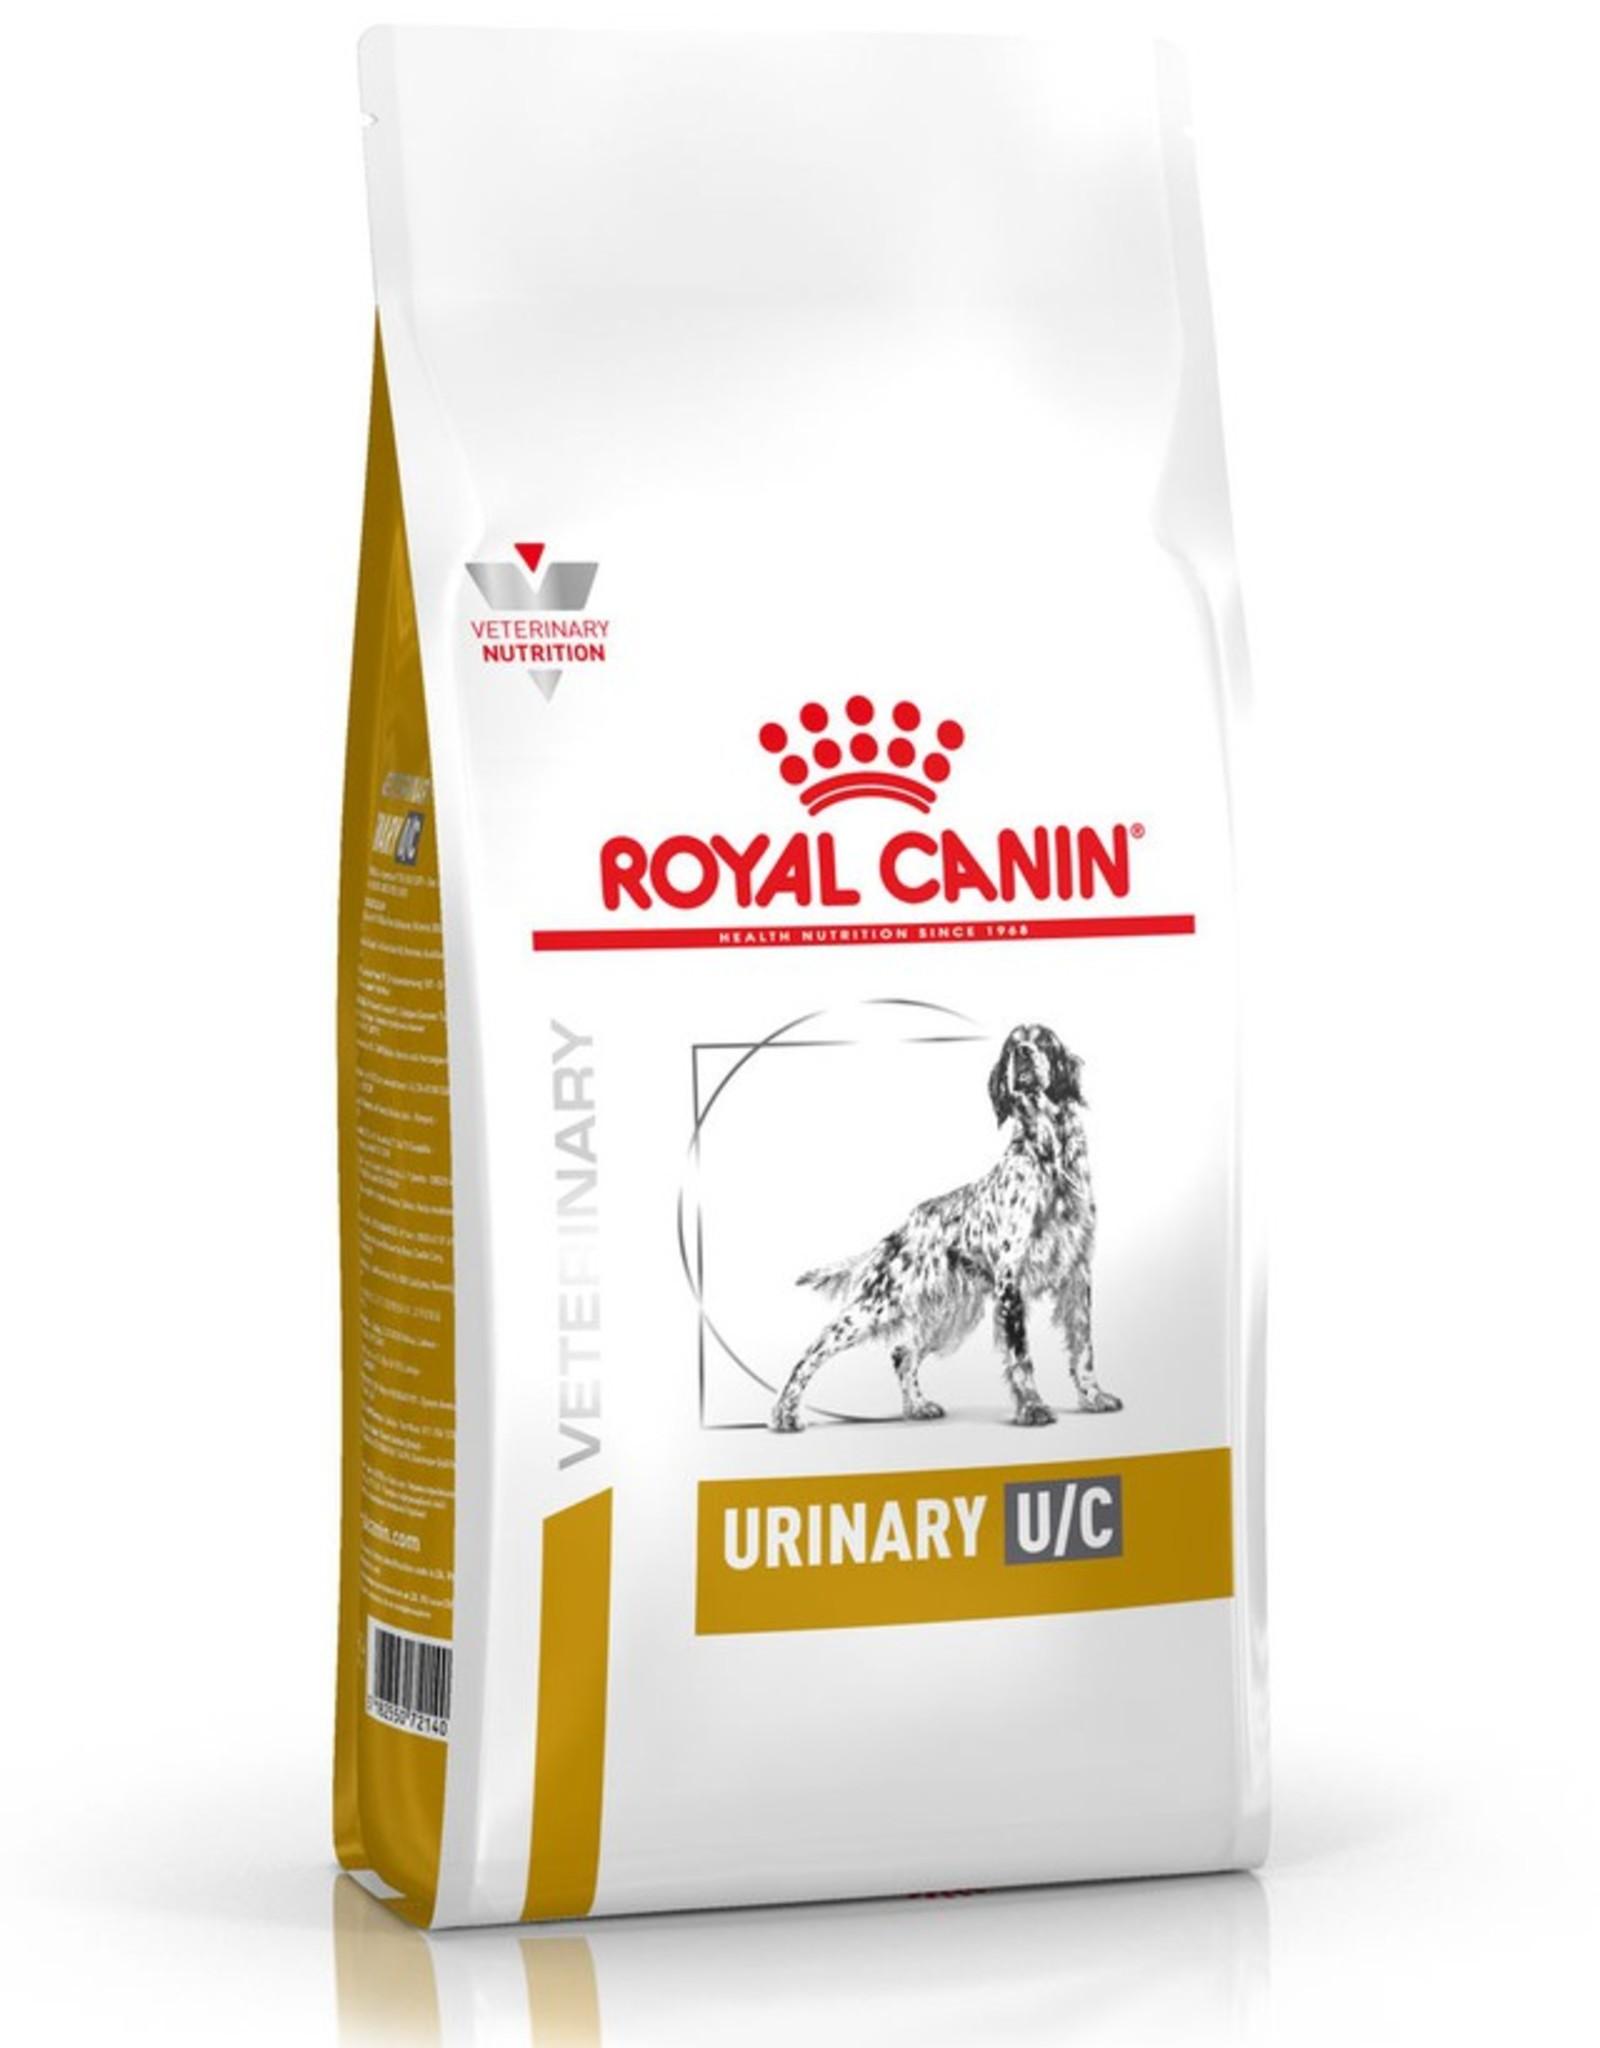 Royal Canin Royal Canin Urinary U/c Low Proteine Dog 2kg